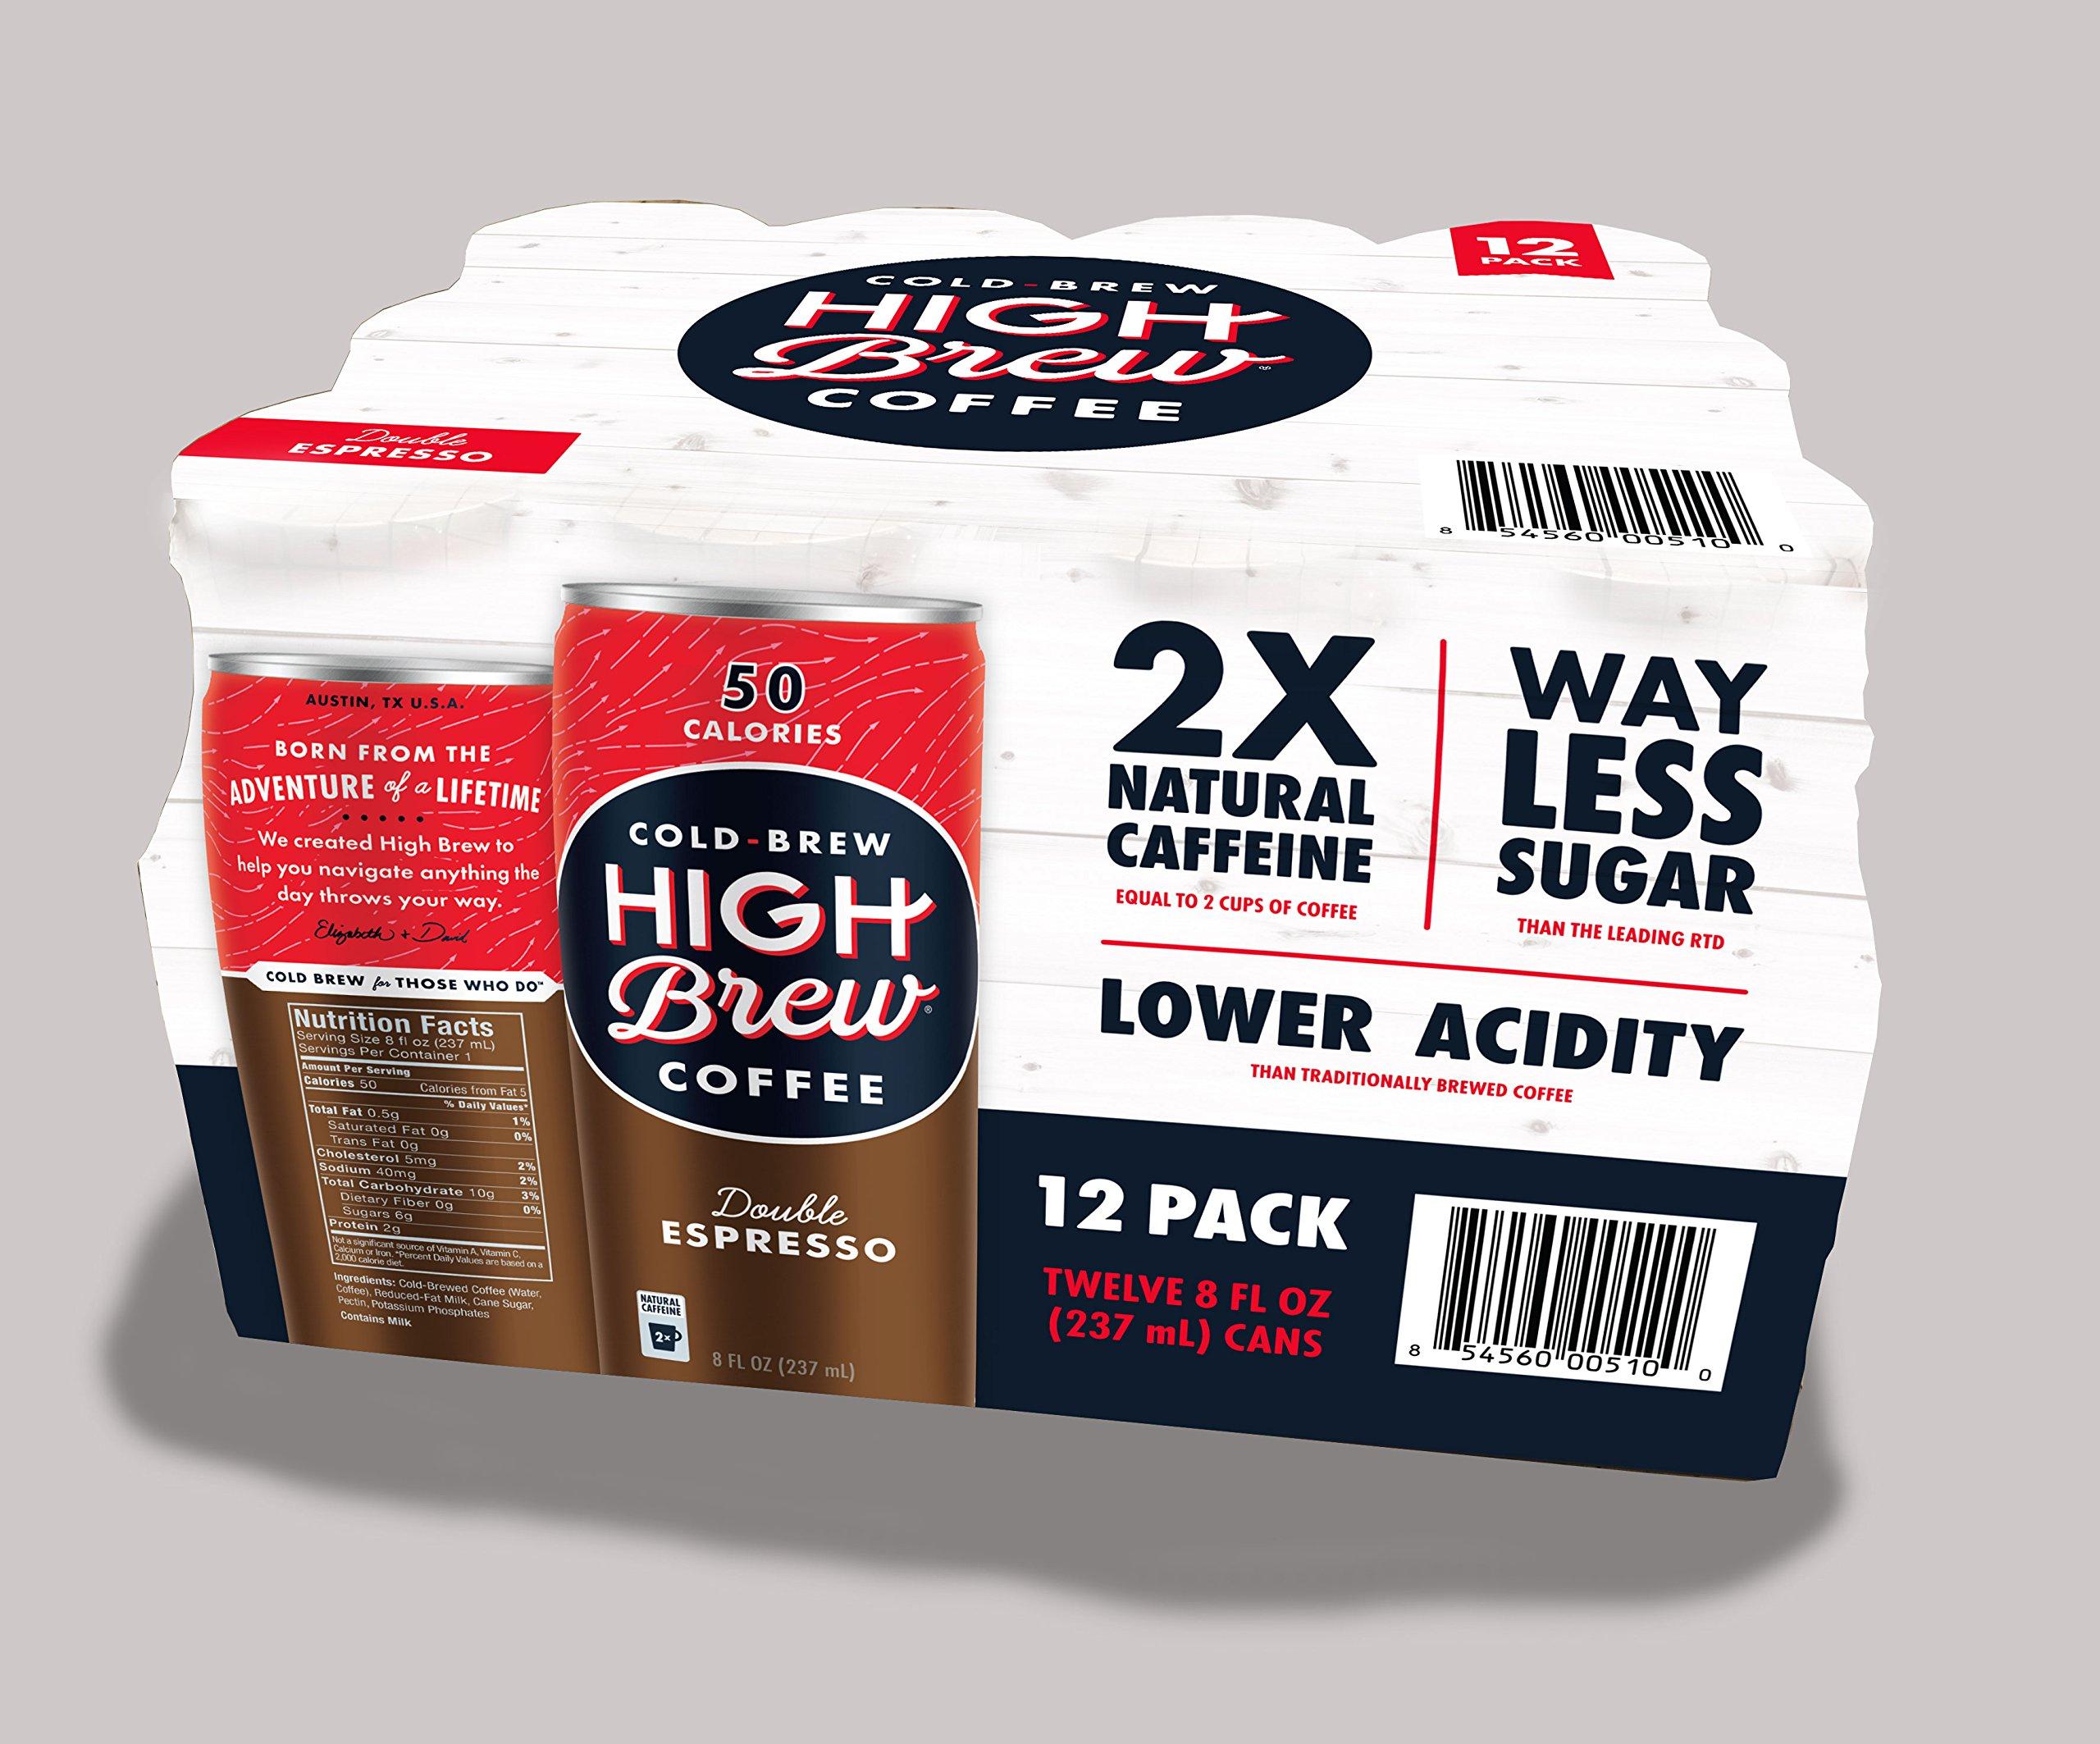 High Brew Double Espresso Club pack, 8 fl oz, 12 pack